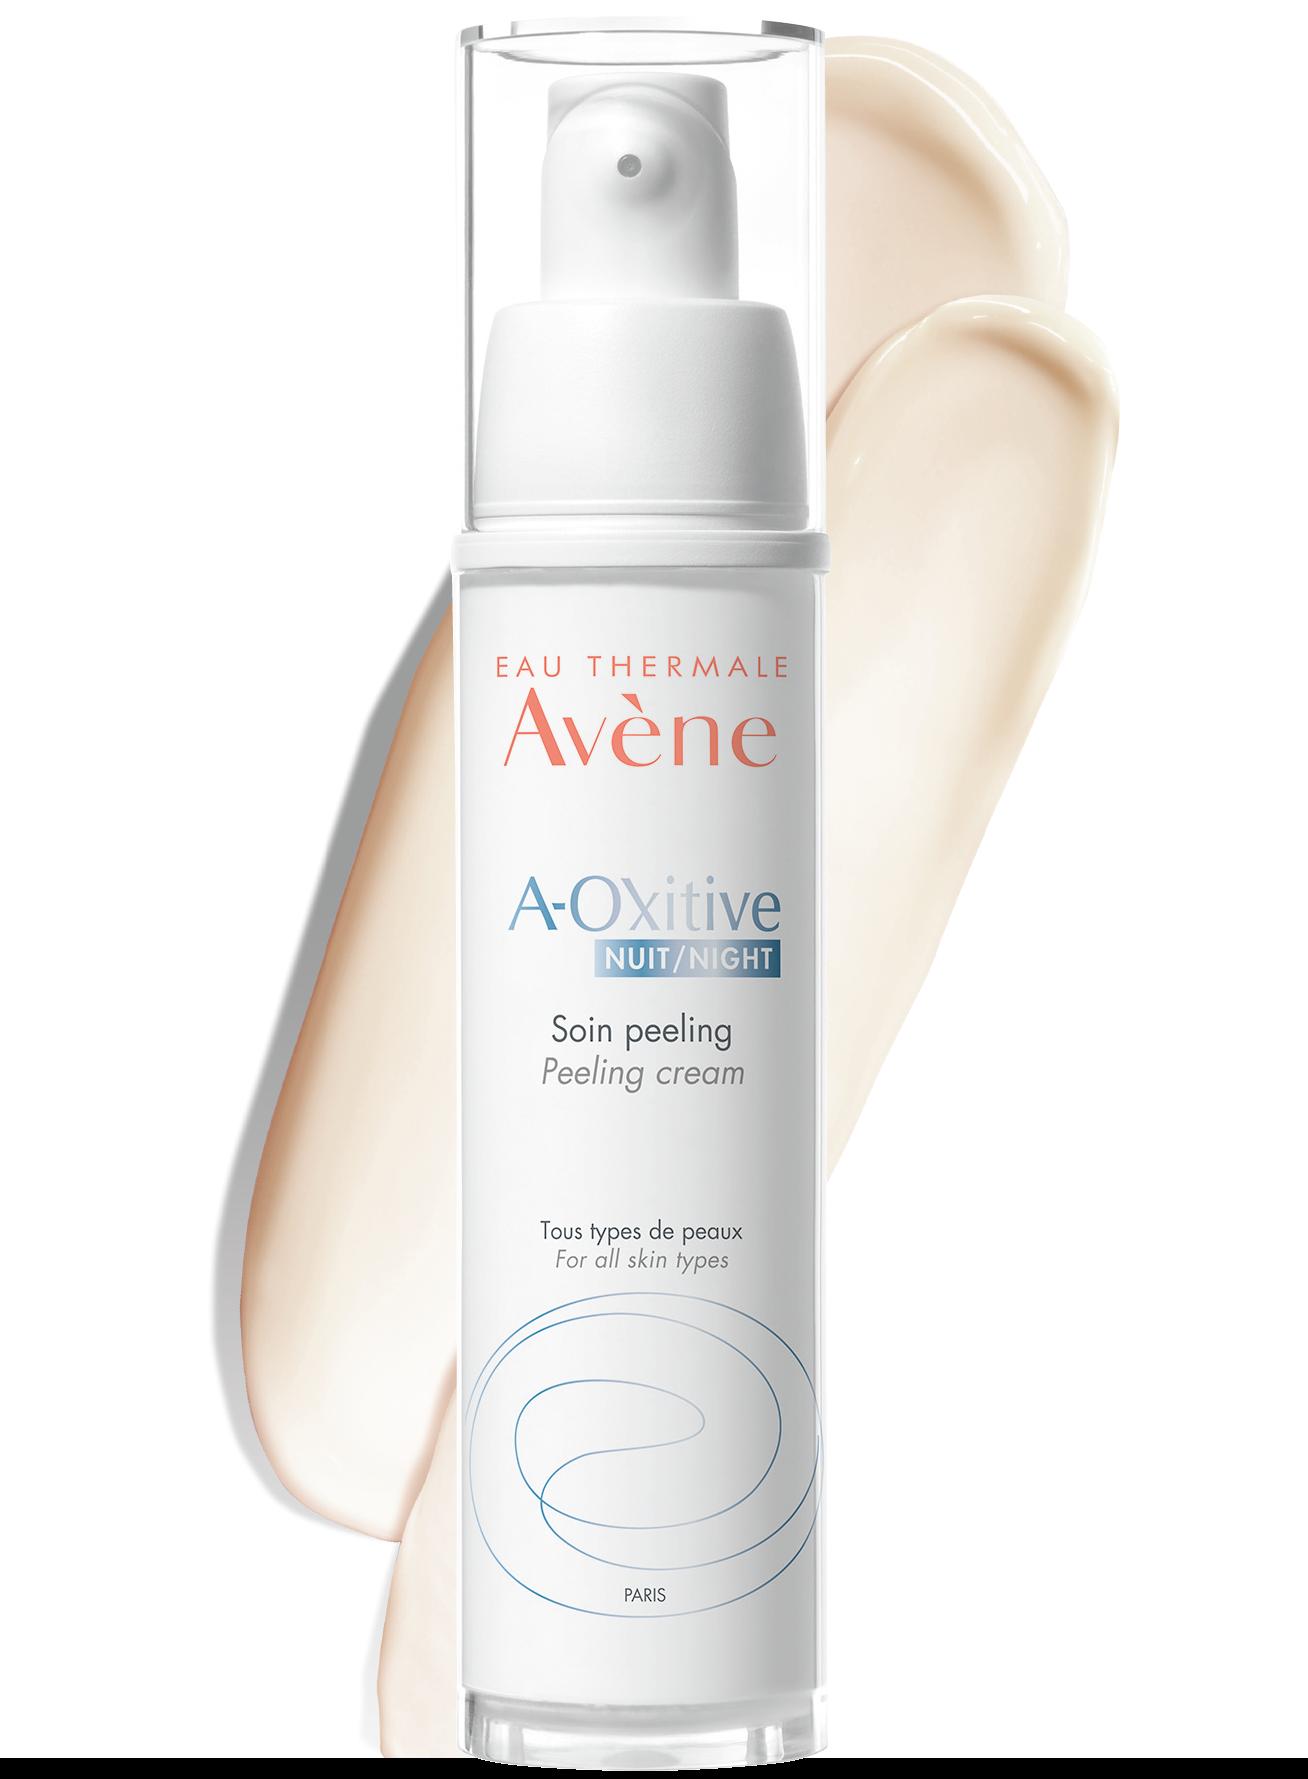 A-Oxitive nouvelle gamme anti-âge